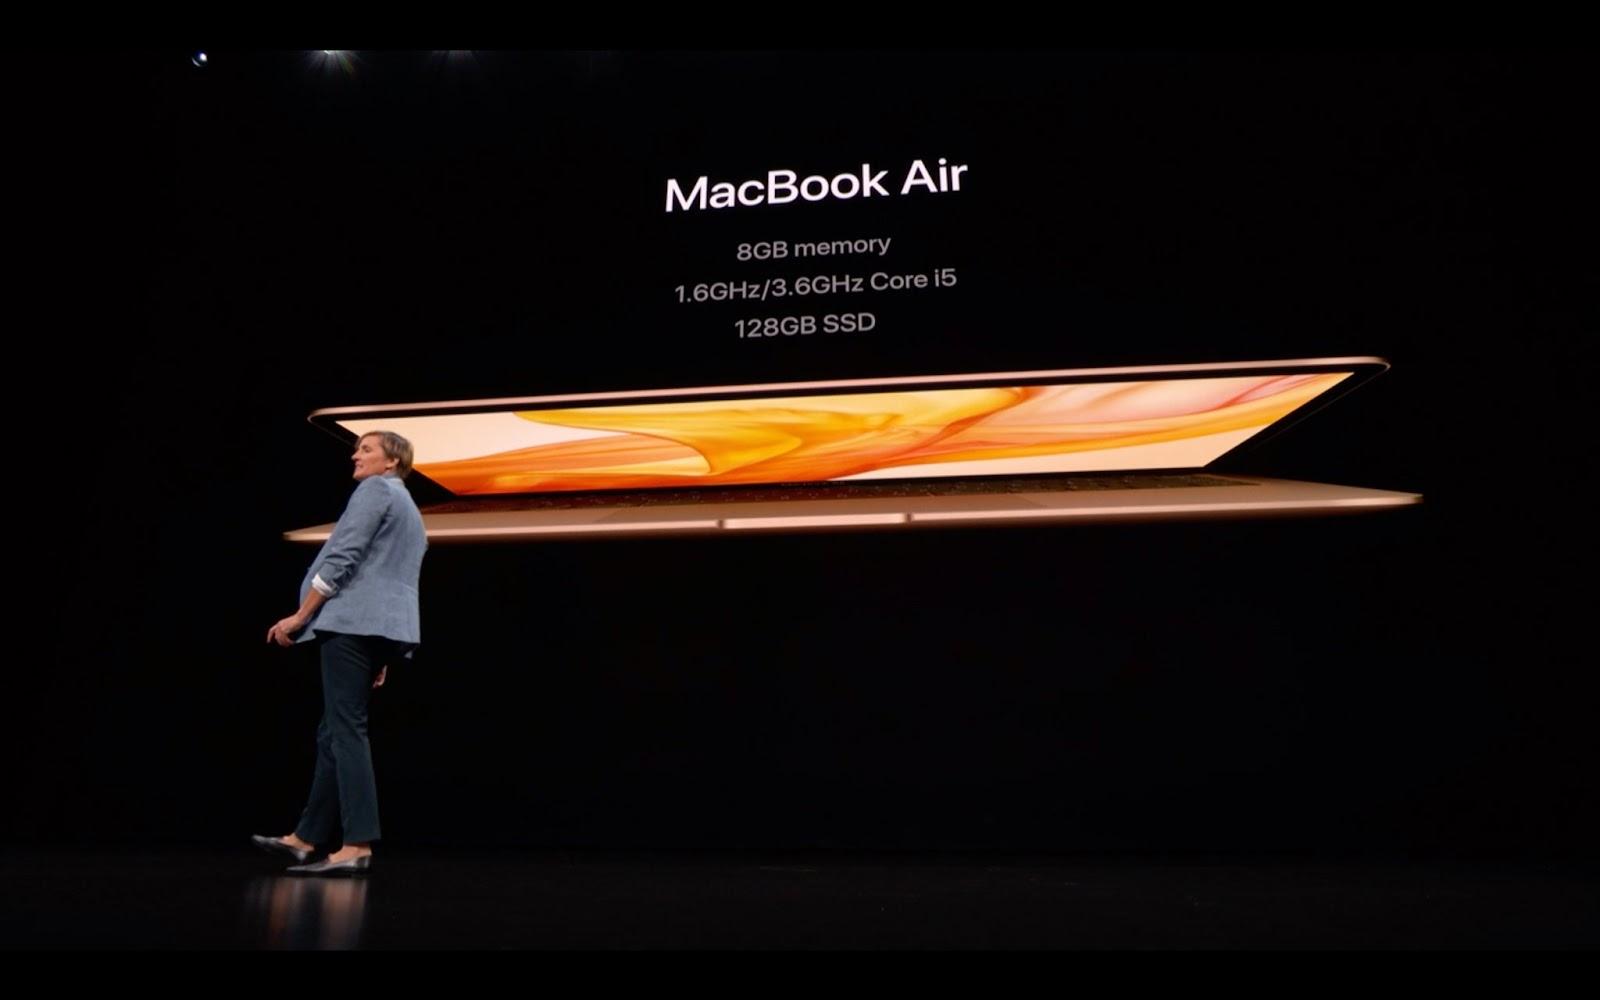 Đang tải Macbook_Air_2018_tinhte-35.jpg…